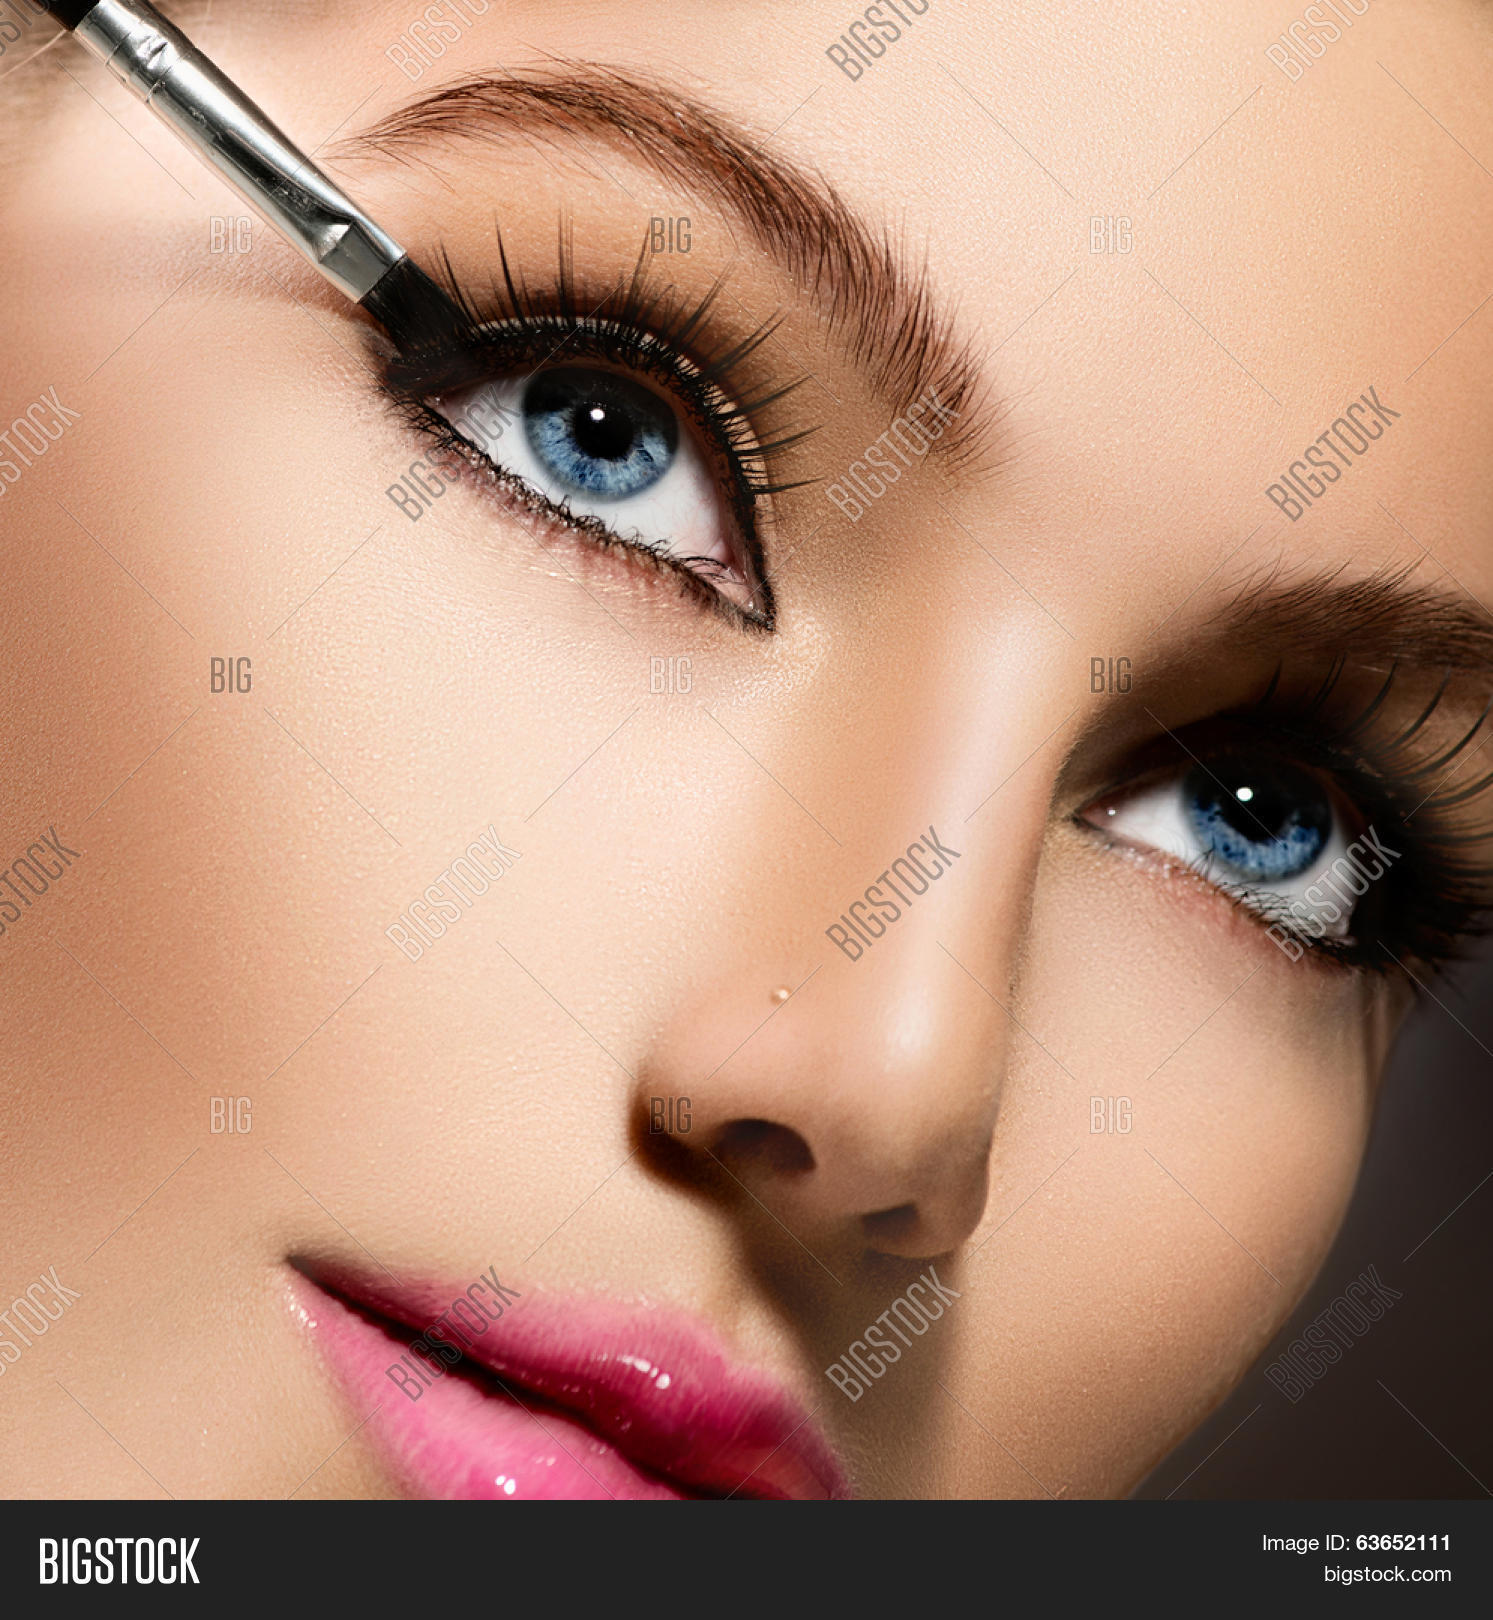 Makeup on eye